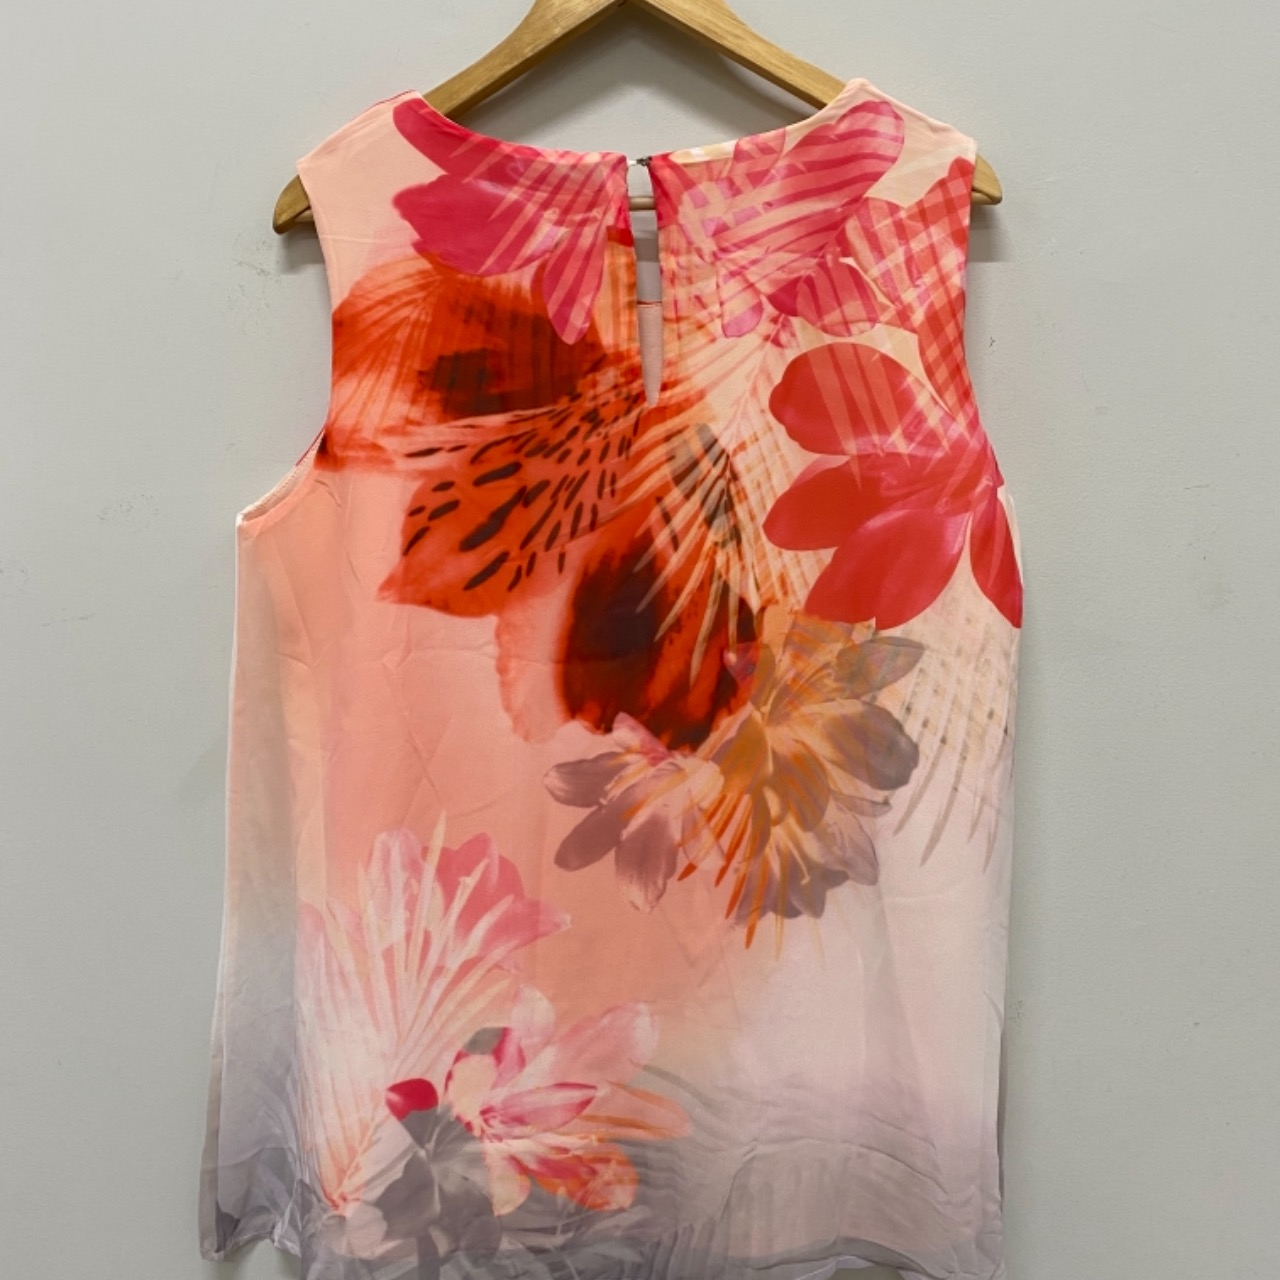 Liz Jordan Womens Floral Top Cream/Floral/Pink